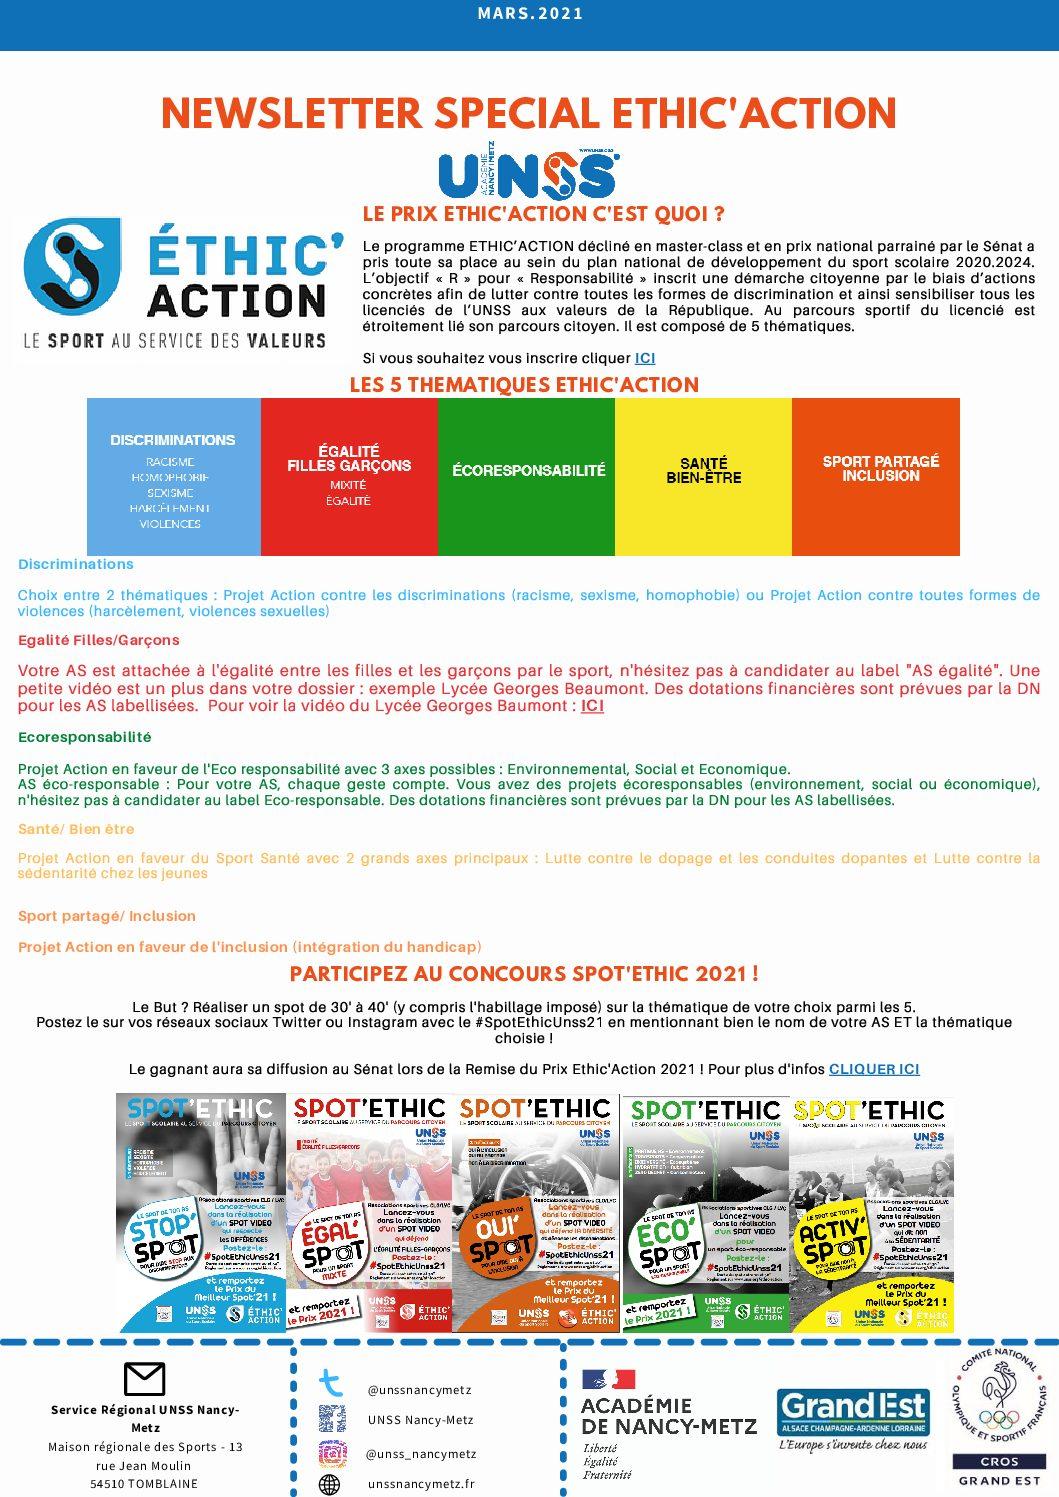 Newsletter Mars Spécial Ethic'Action